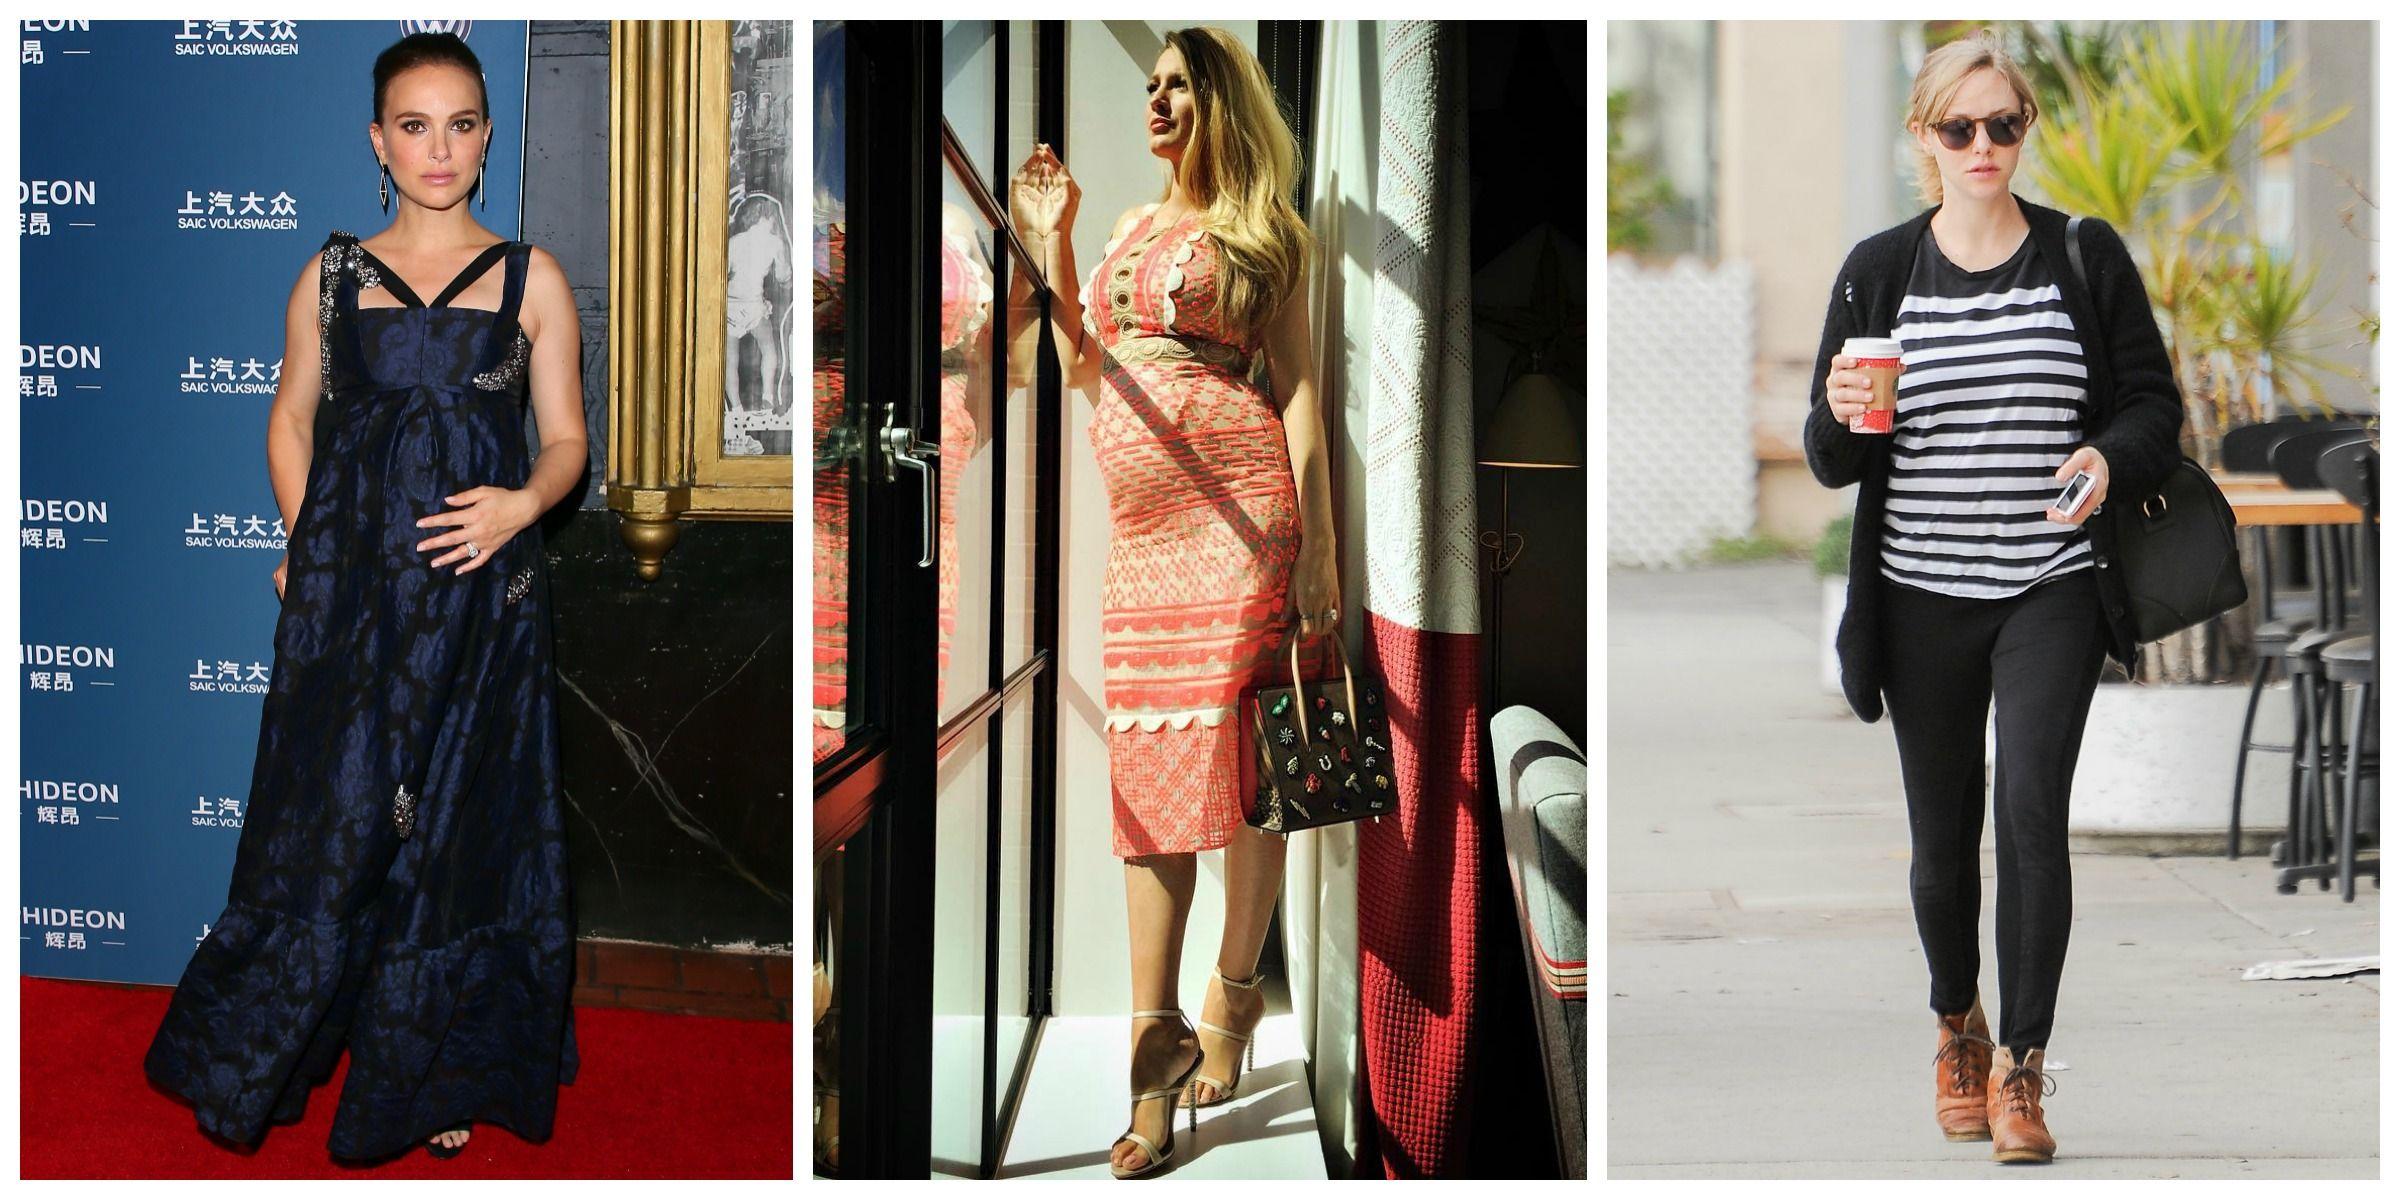 The Best Celebrity Maternity Style